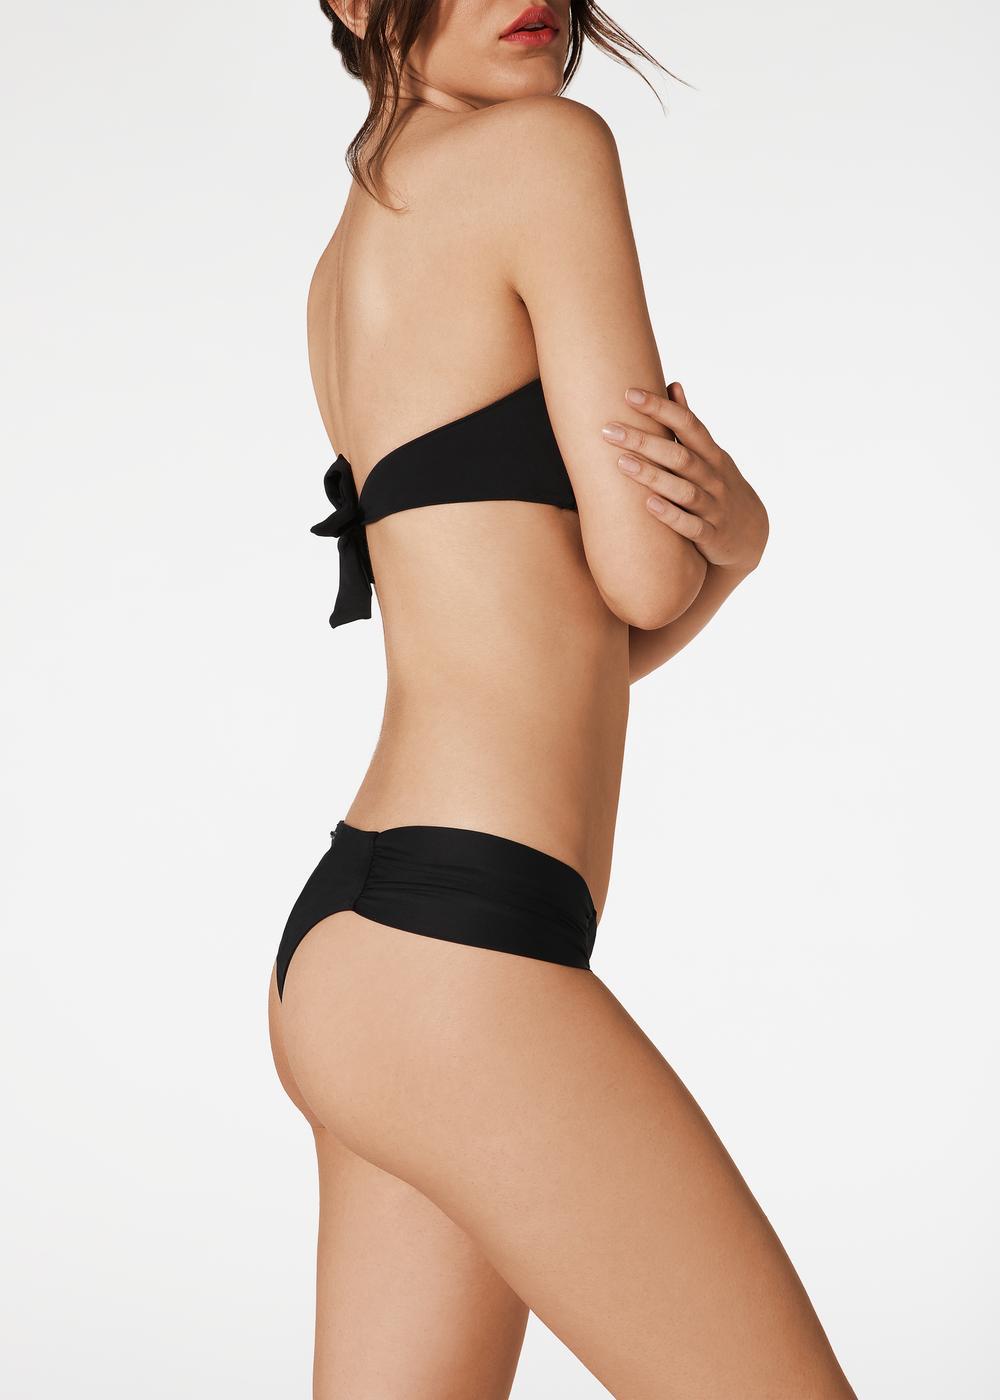 Indonesia Ruffle Brazilian Bikini Bottoms